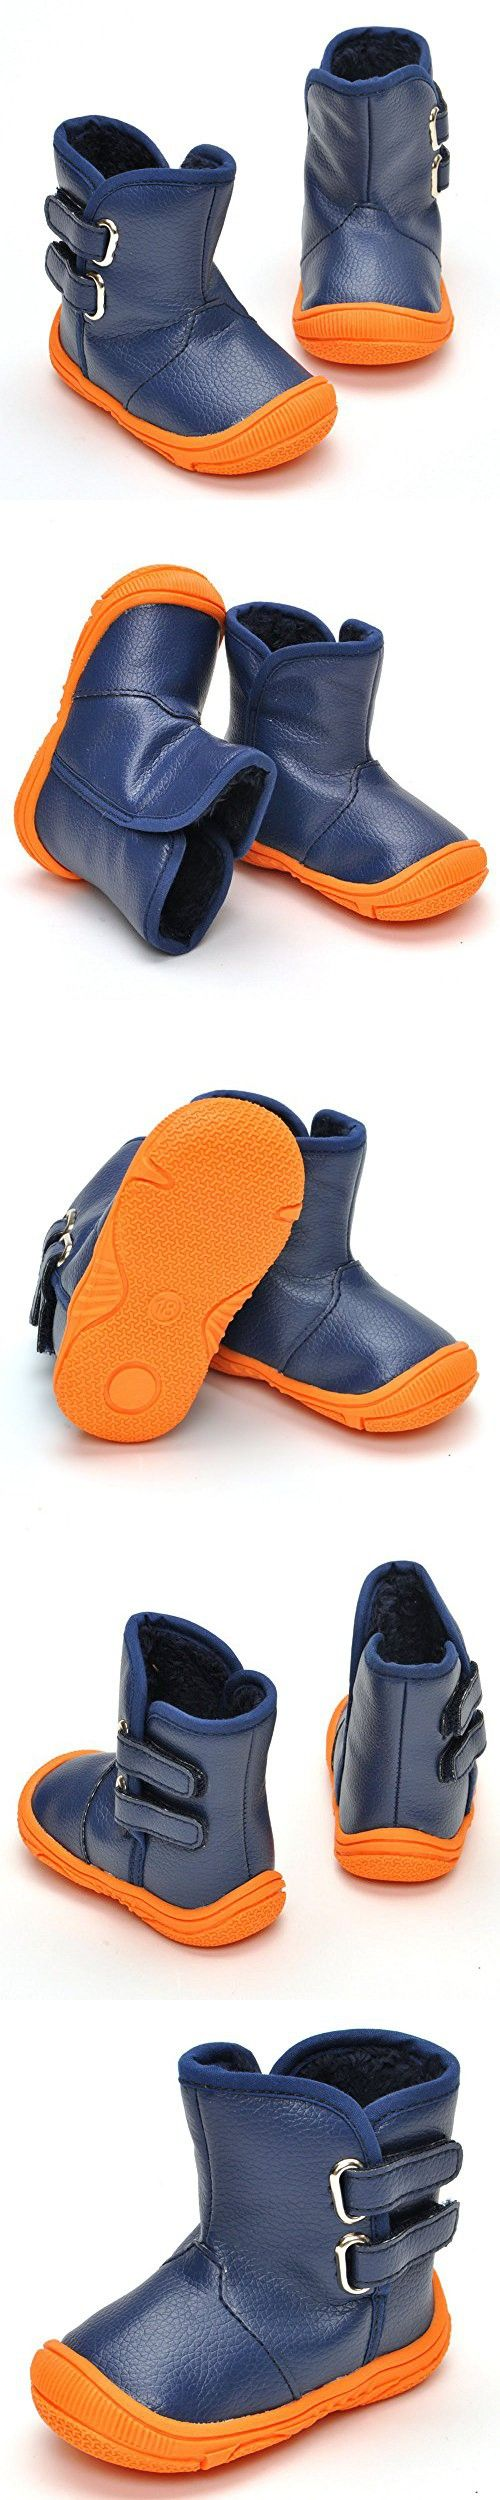 Enteer Infant Baby Boys' Soft Rubber Sole Anti-Slip Warm Winter Prewalker Leather Toddler Boots (19-24months, blue)